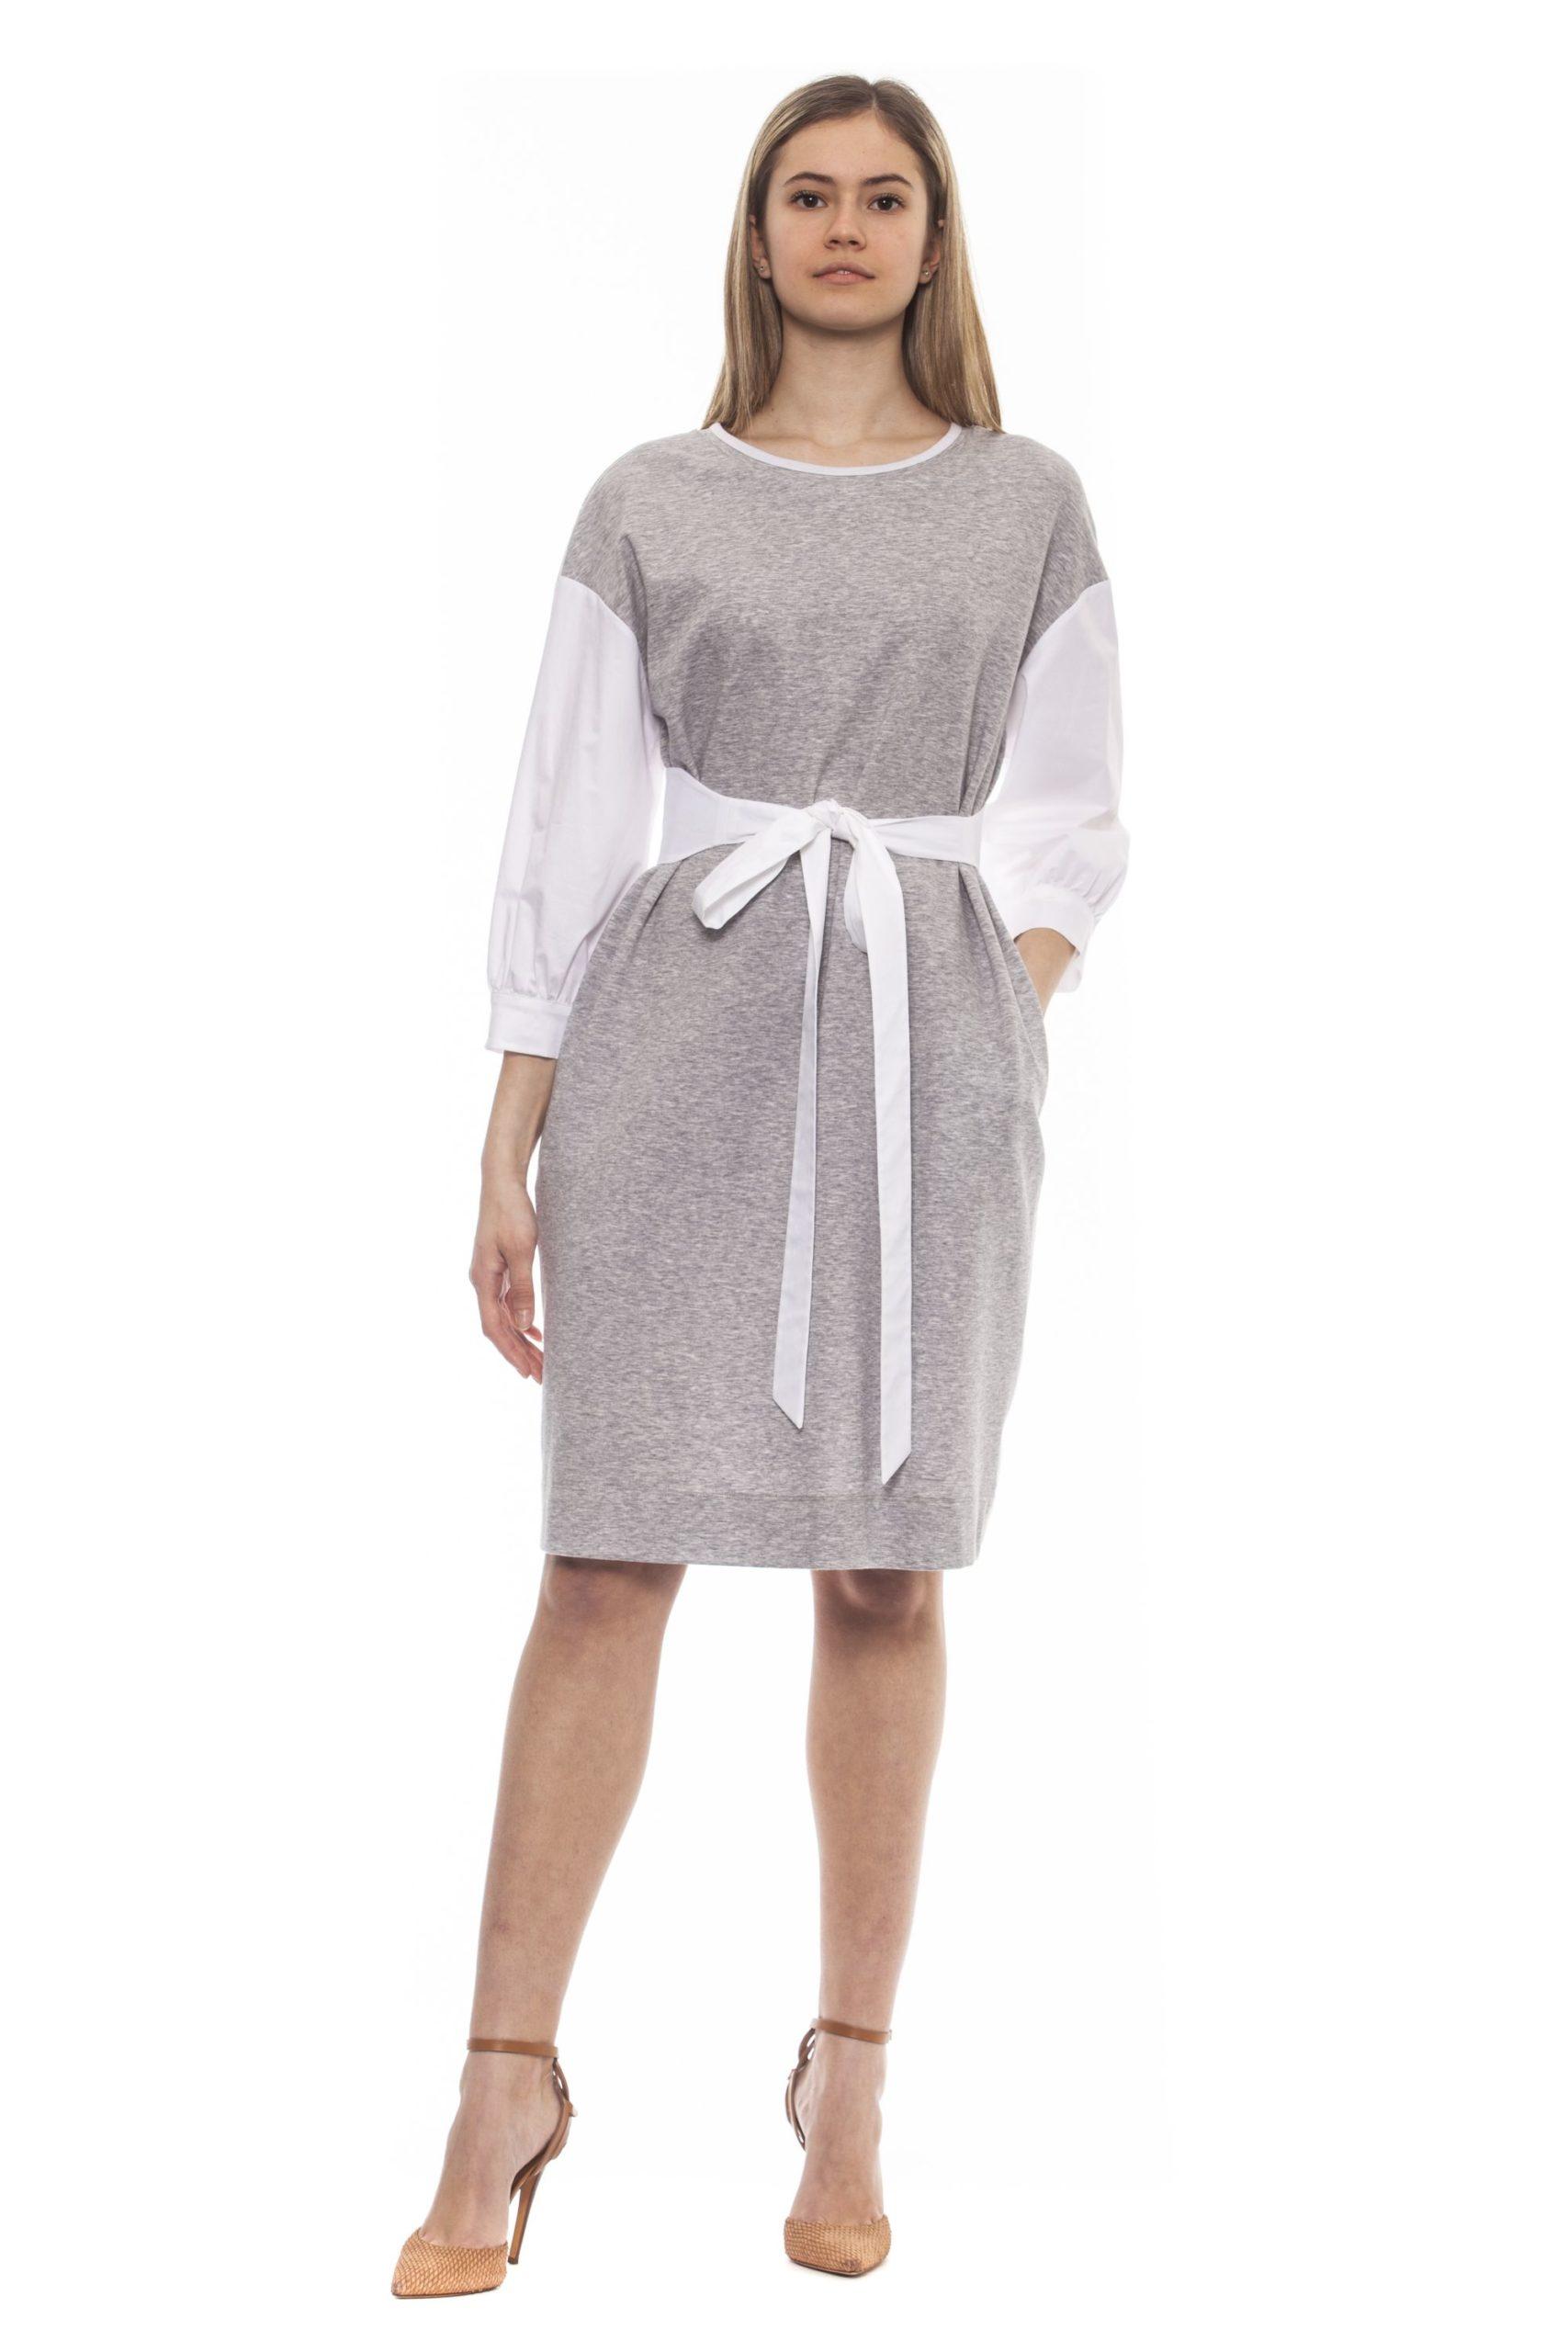 Peserico Women's Grigio Dress Gray PE1381744 - IT42 | S